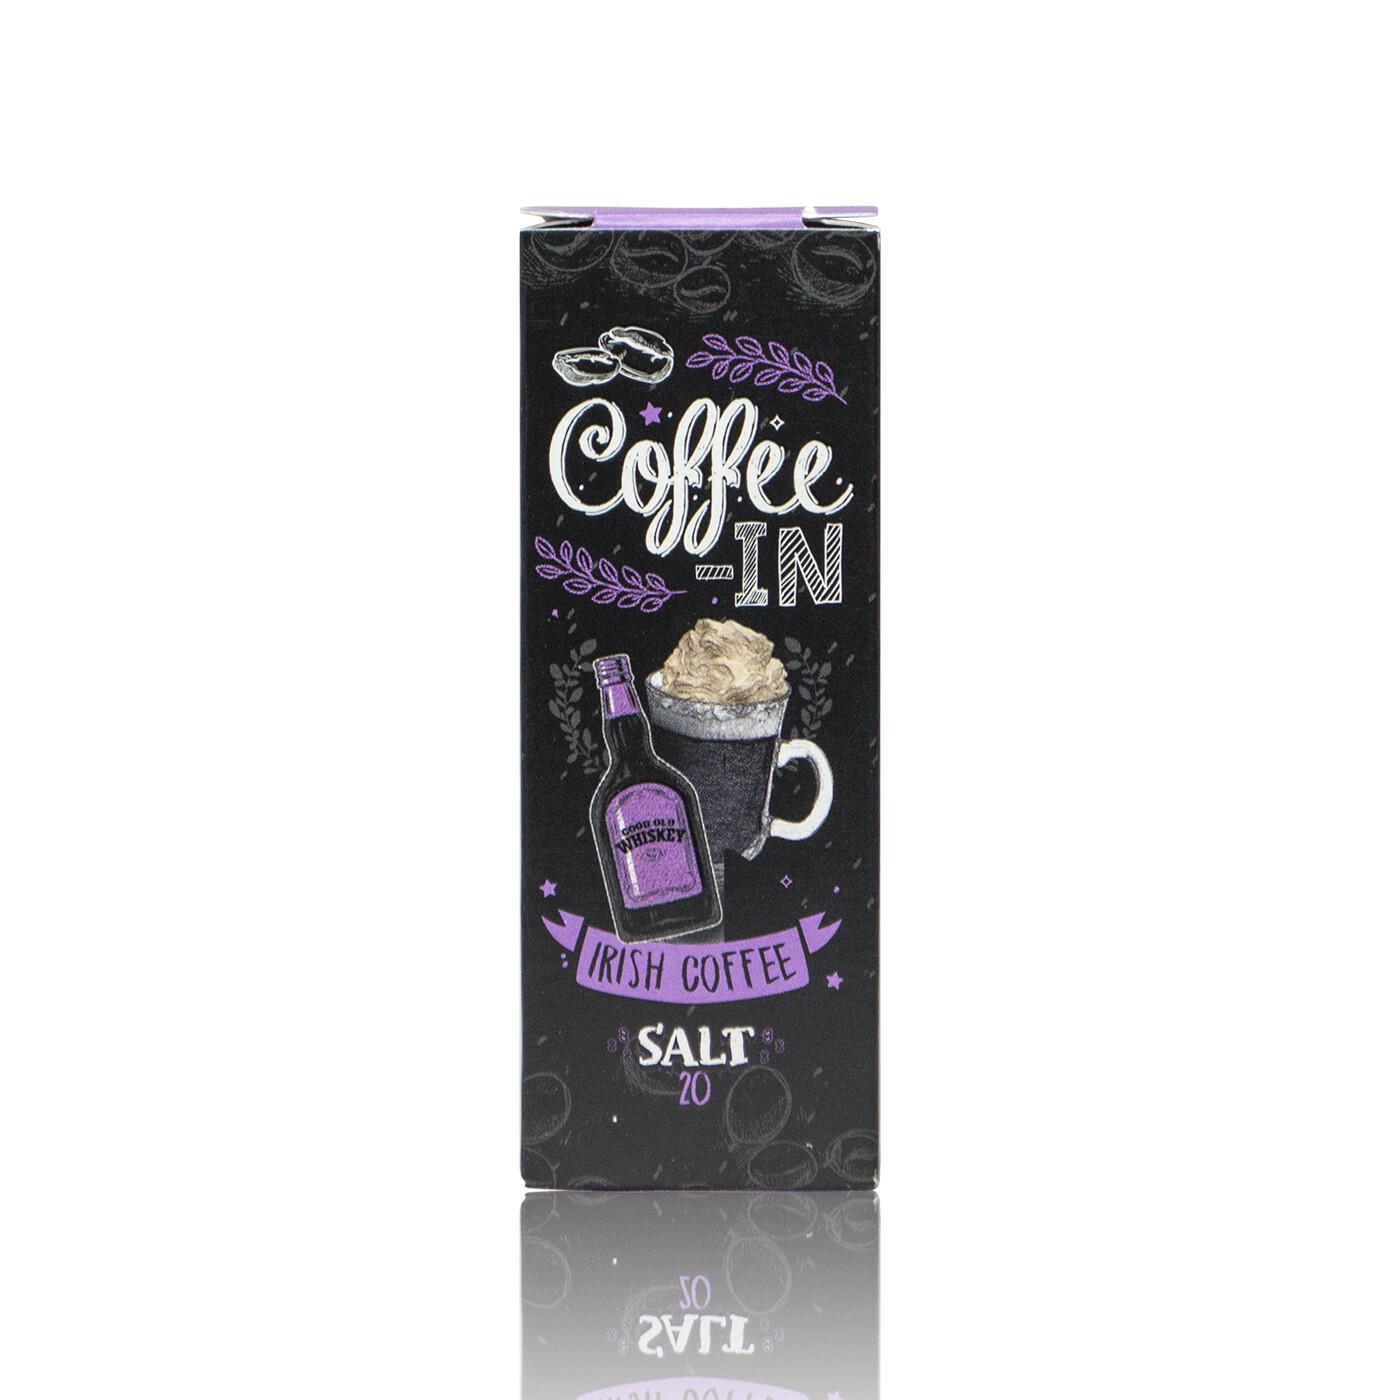 COFFE-IN SALT: IRISH 20MG